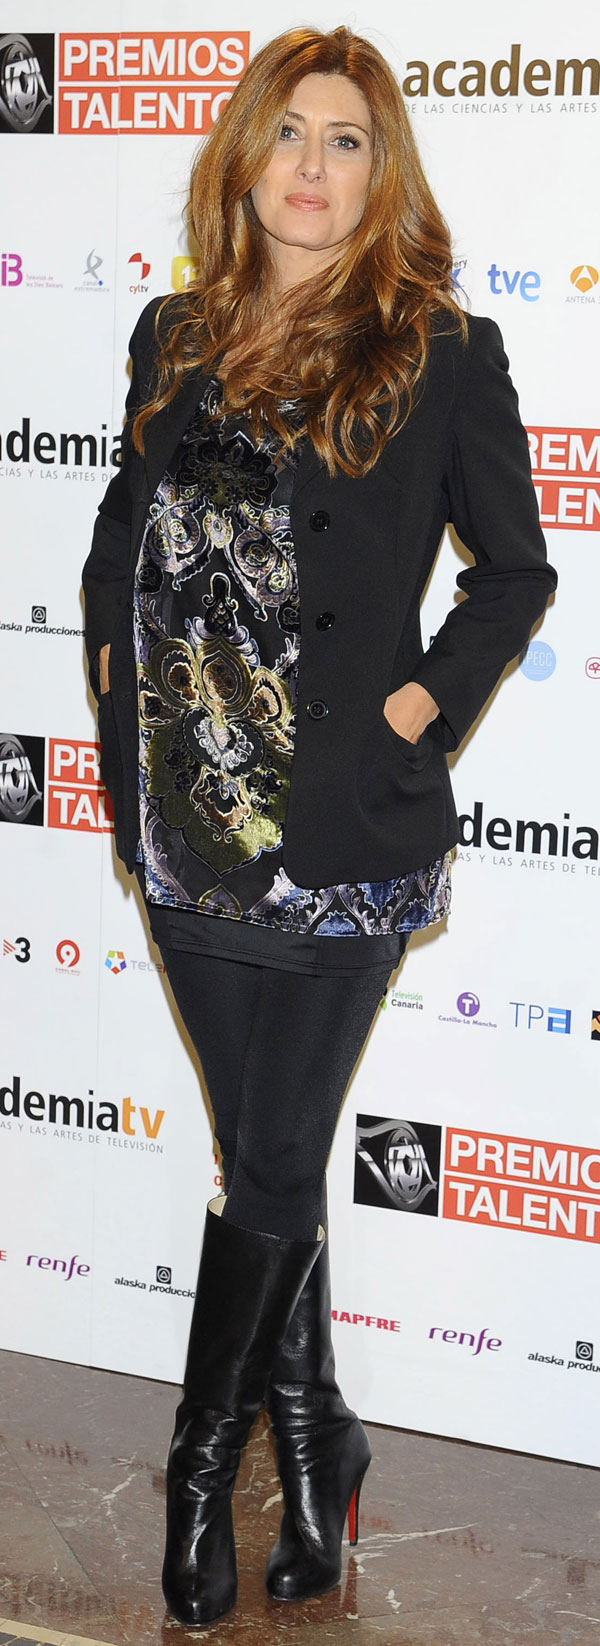 Premios-Talento Patricia Betancourt